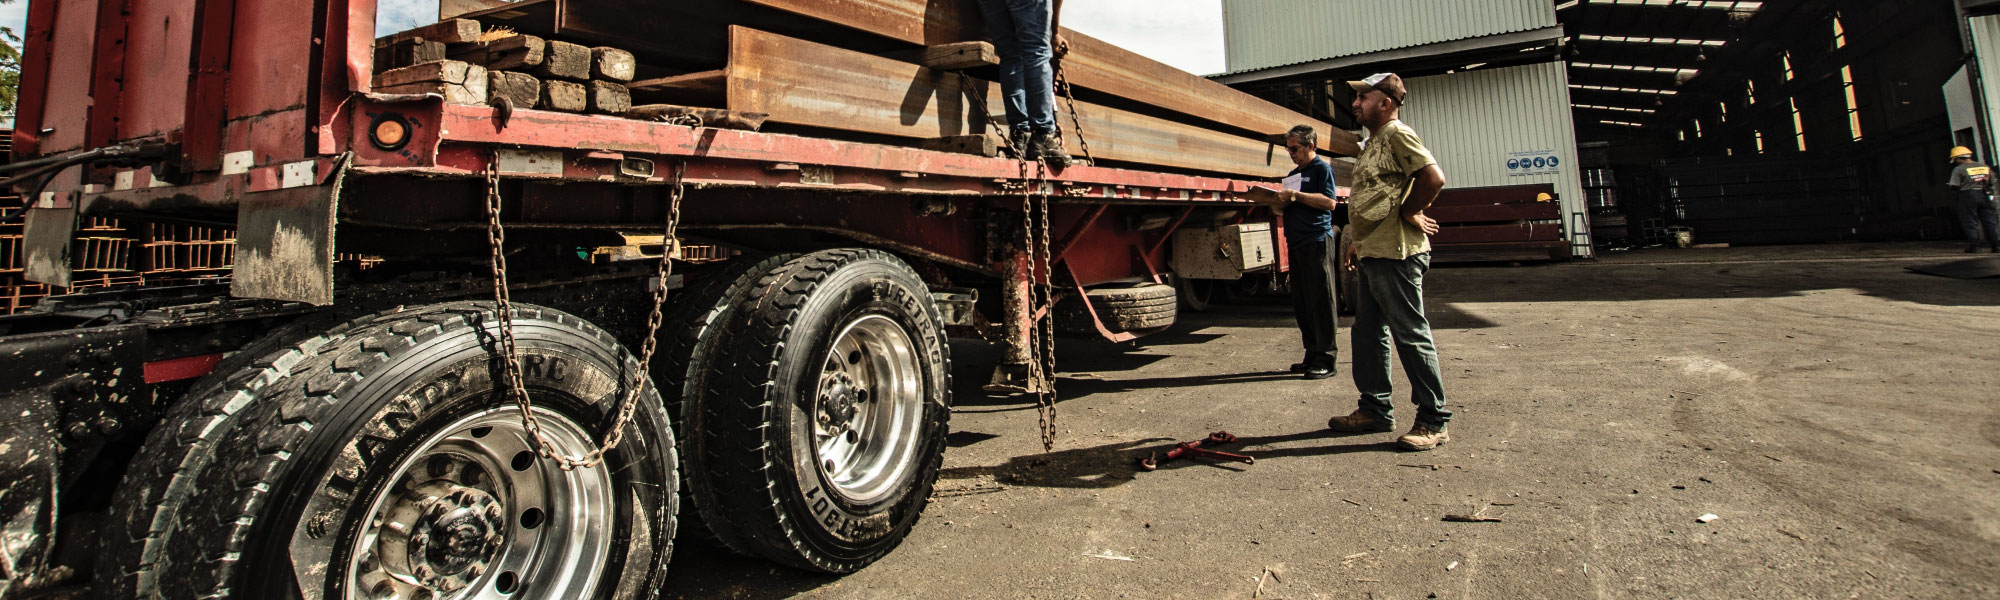 Willy's Hot Shot • Morgantown WV Hot Shot Trucking Service